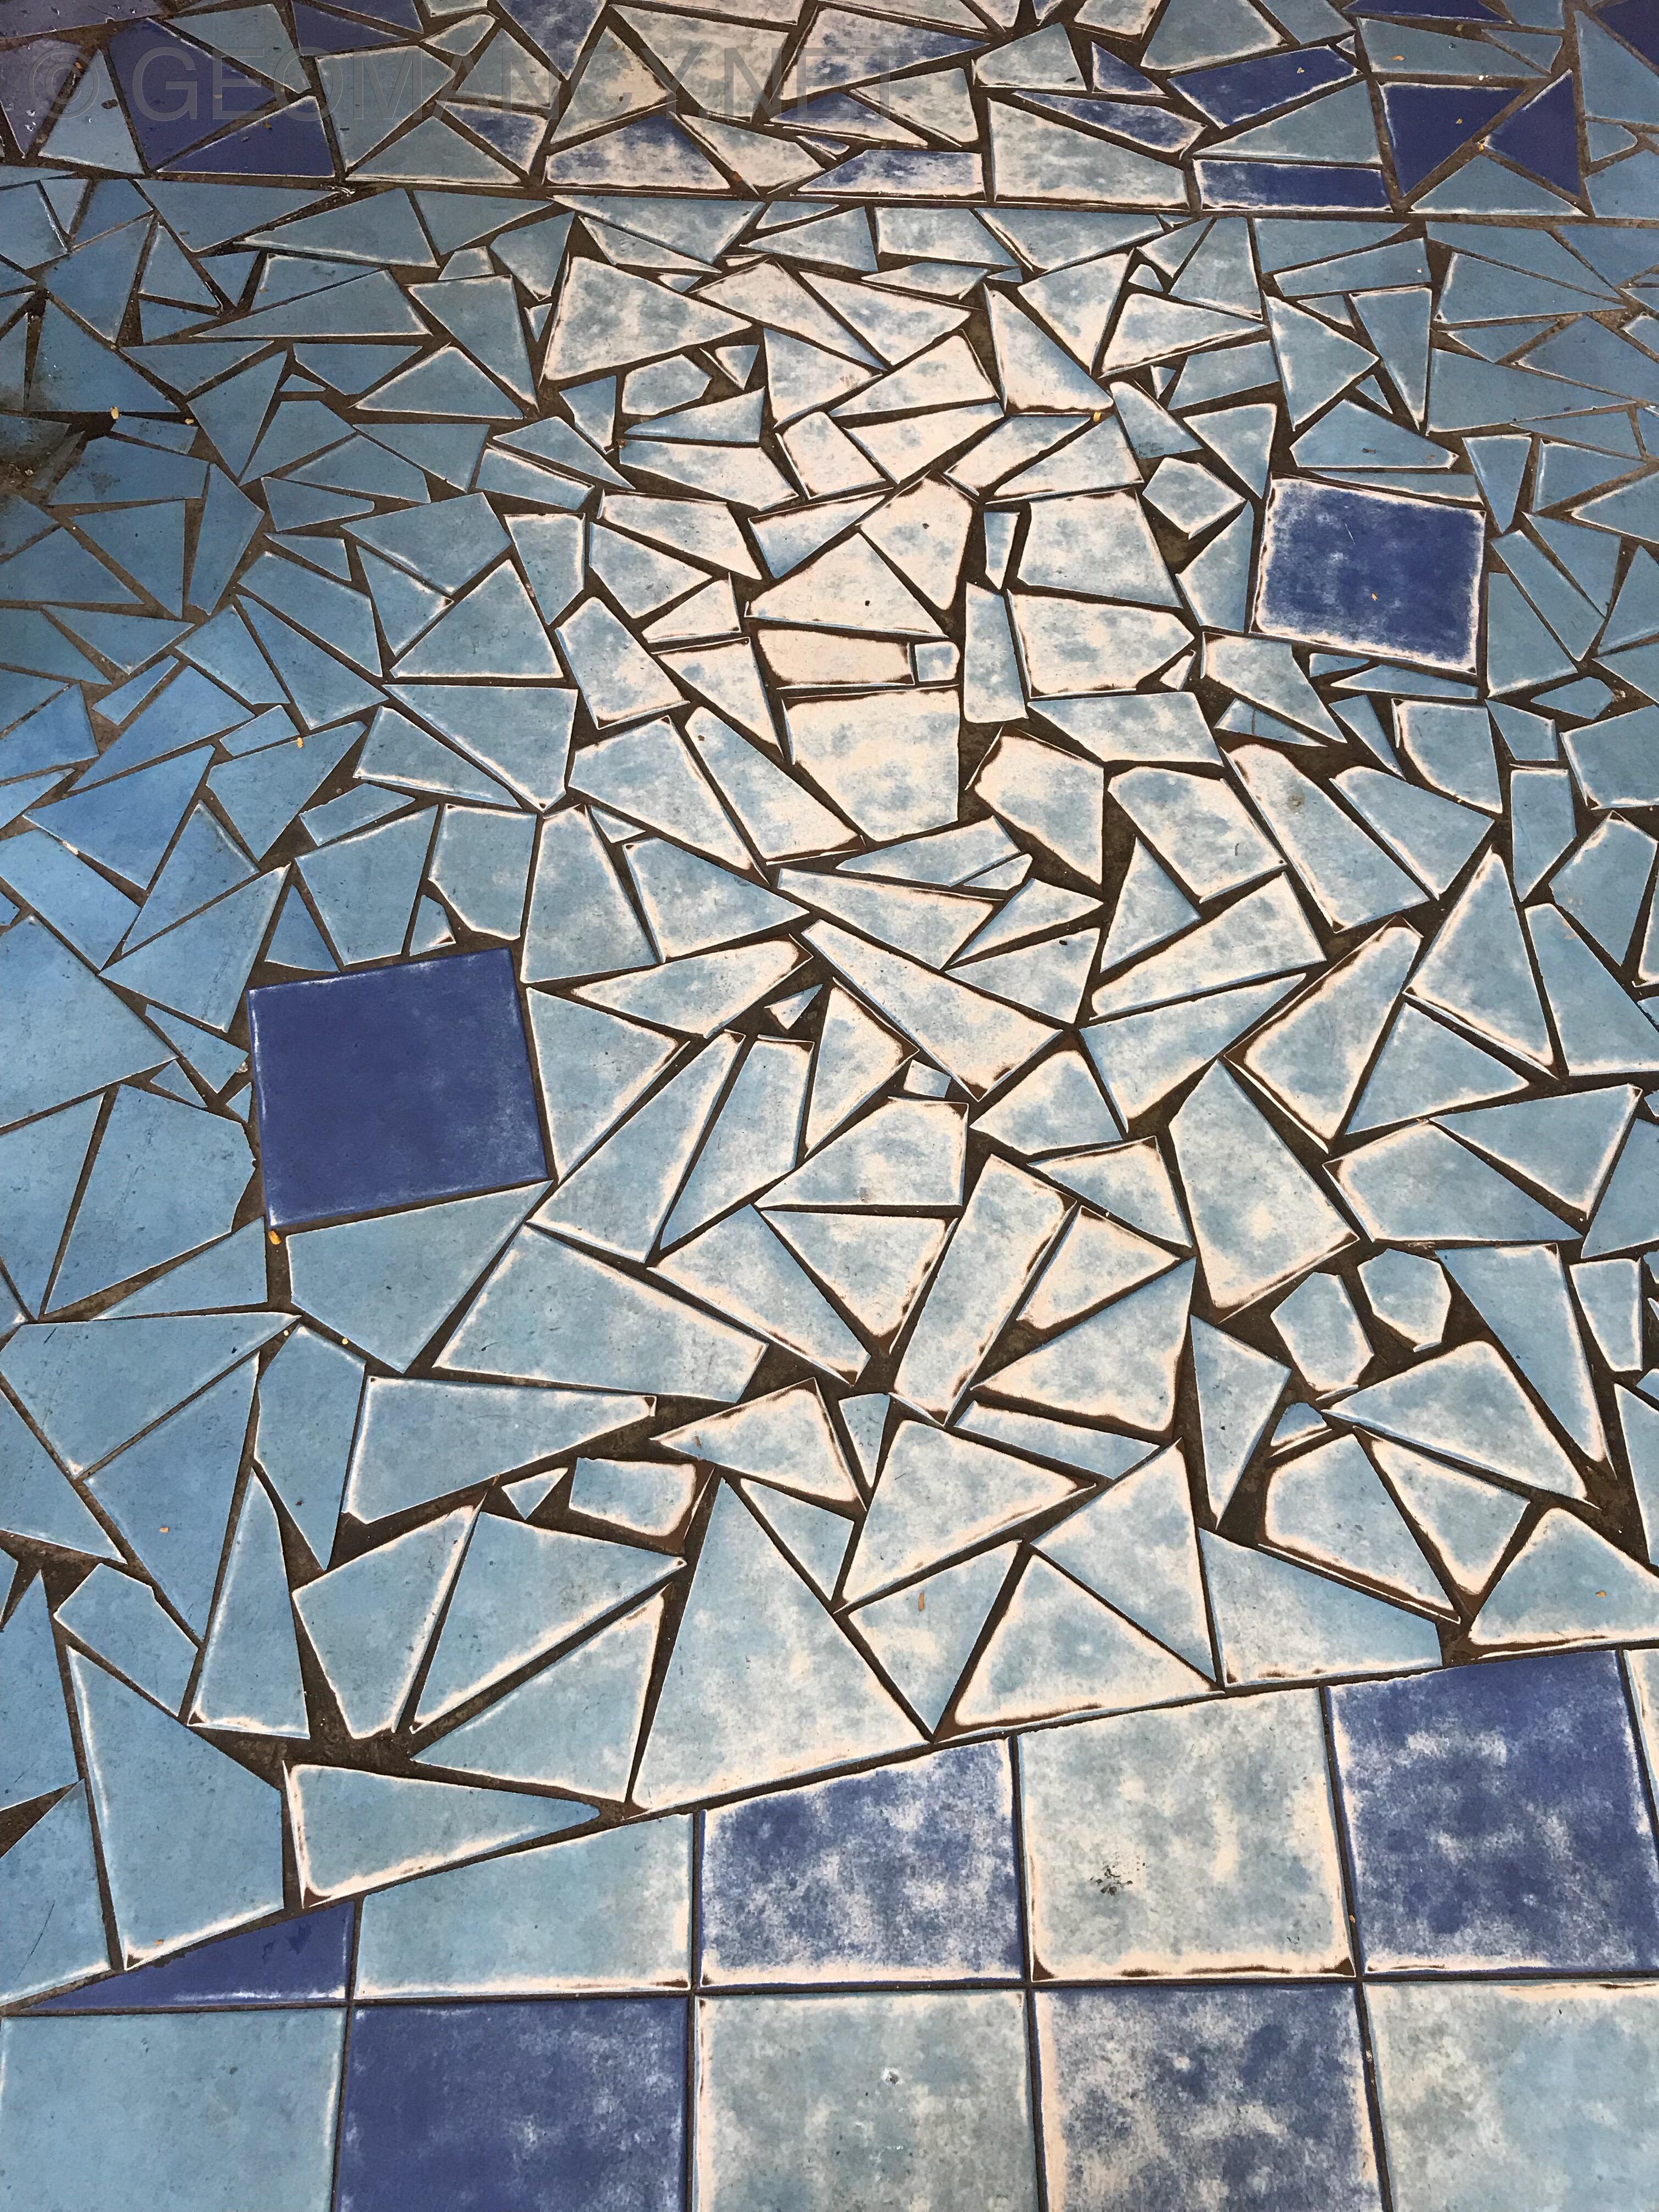 Broken tiles flooring feng shui tips guidelines fengshui fb64d4d0 21dd 4c47 affb cc7ec34a7ca2eg dailygadgetfo Choice Image